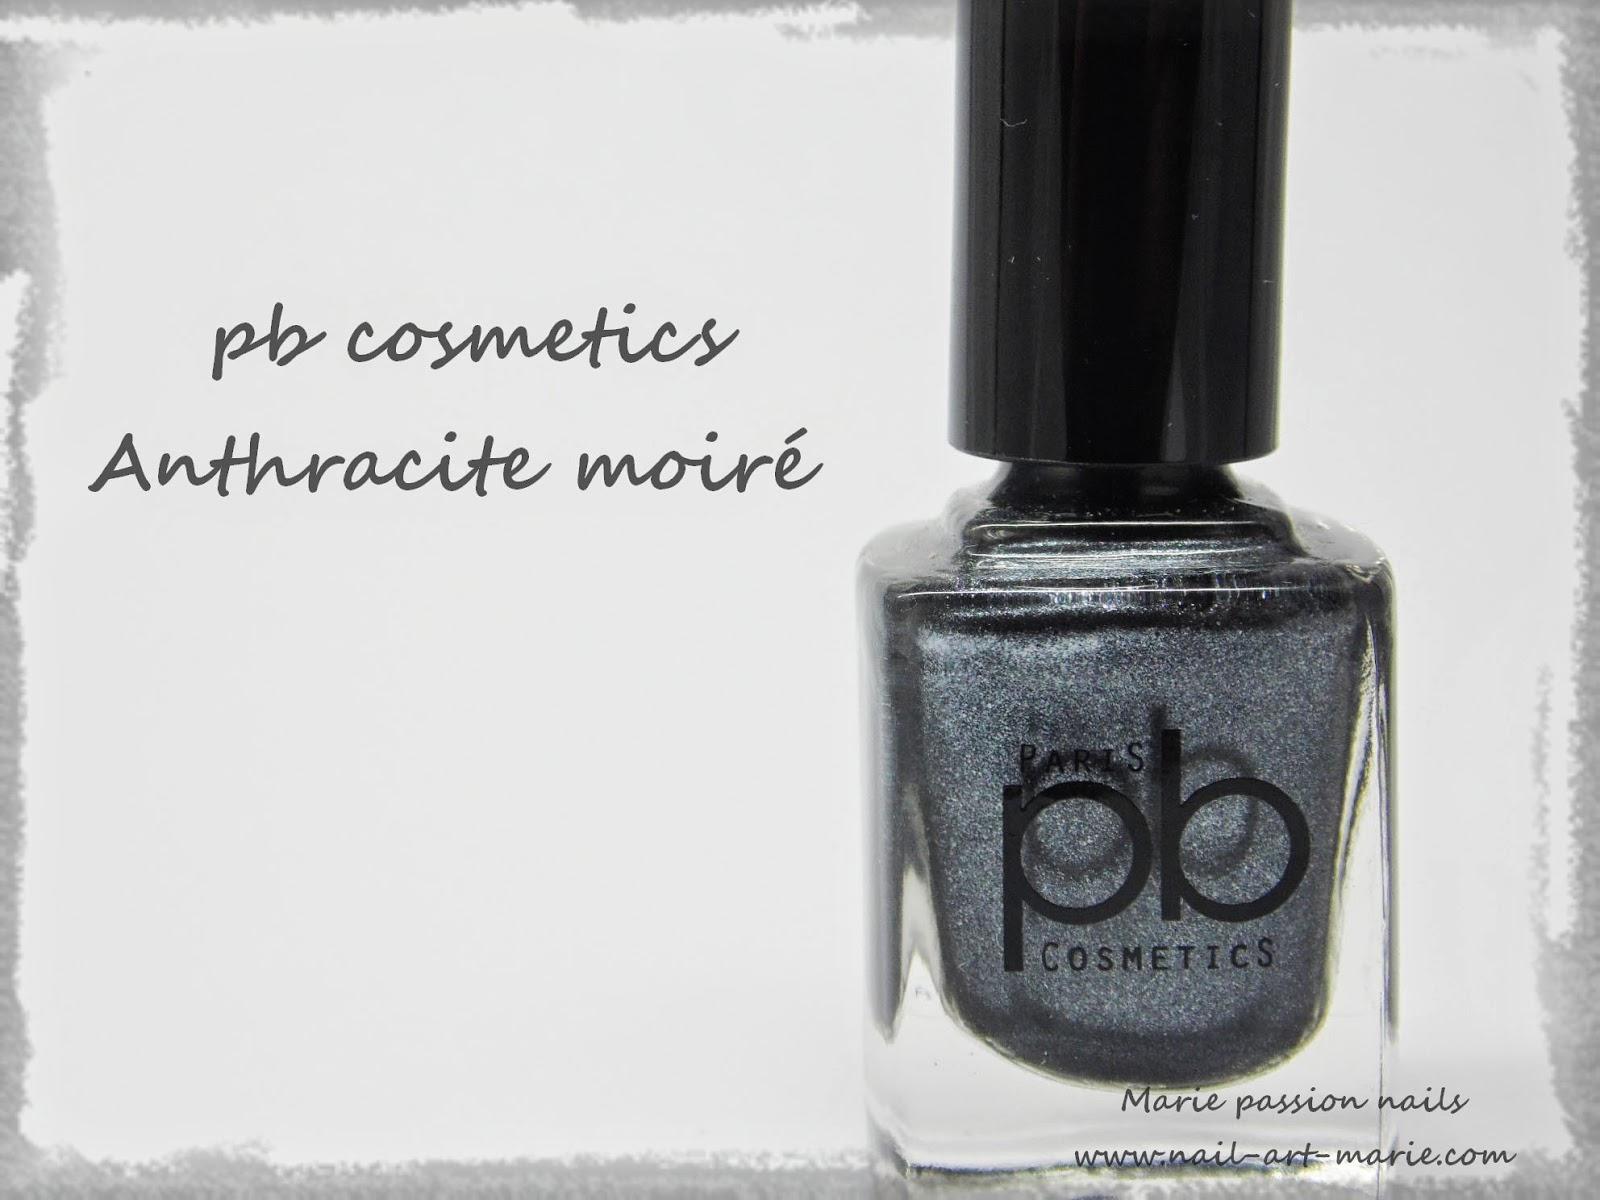 PB Cosmetics Anthracite Moiré1